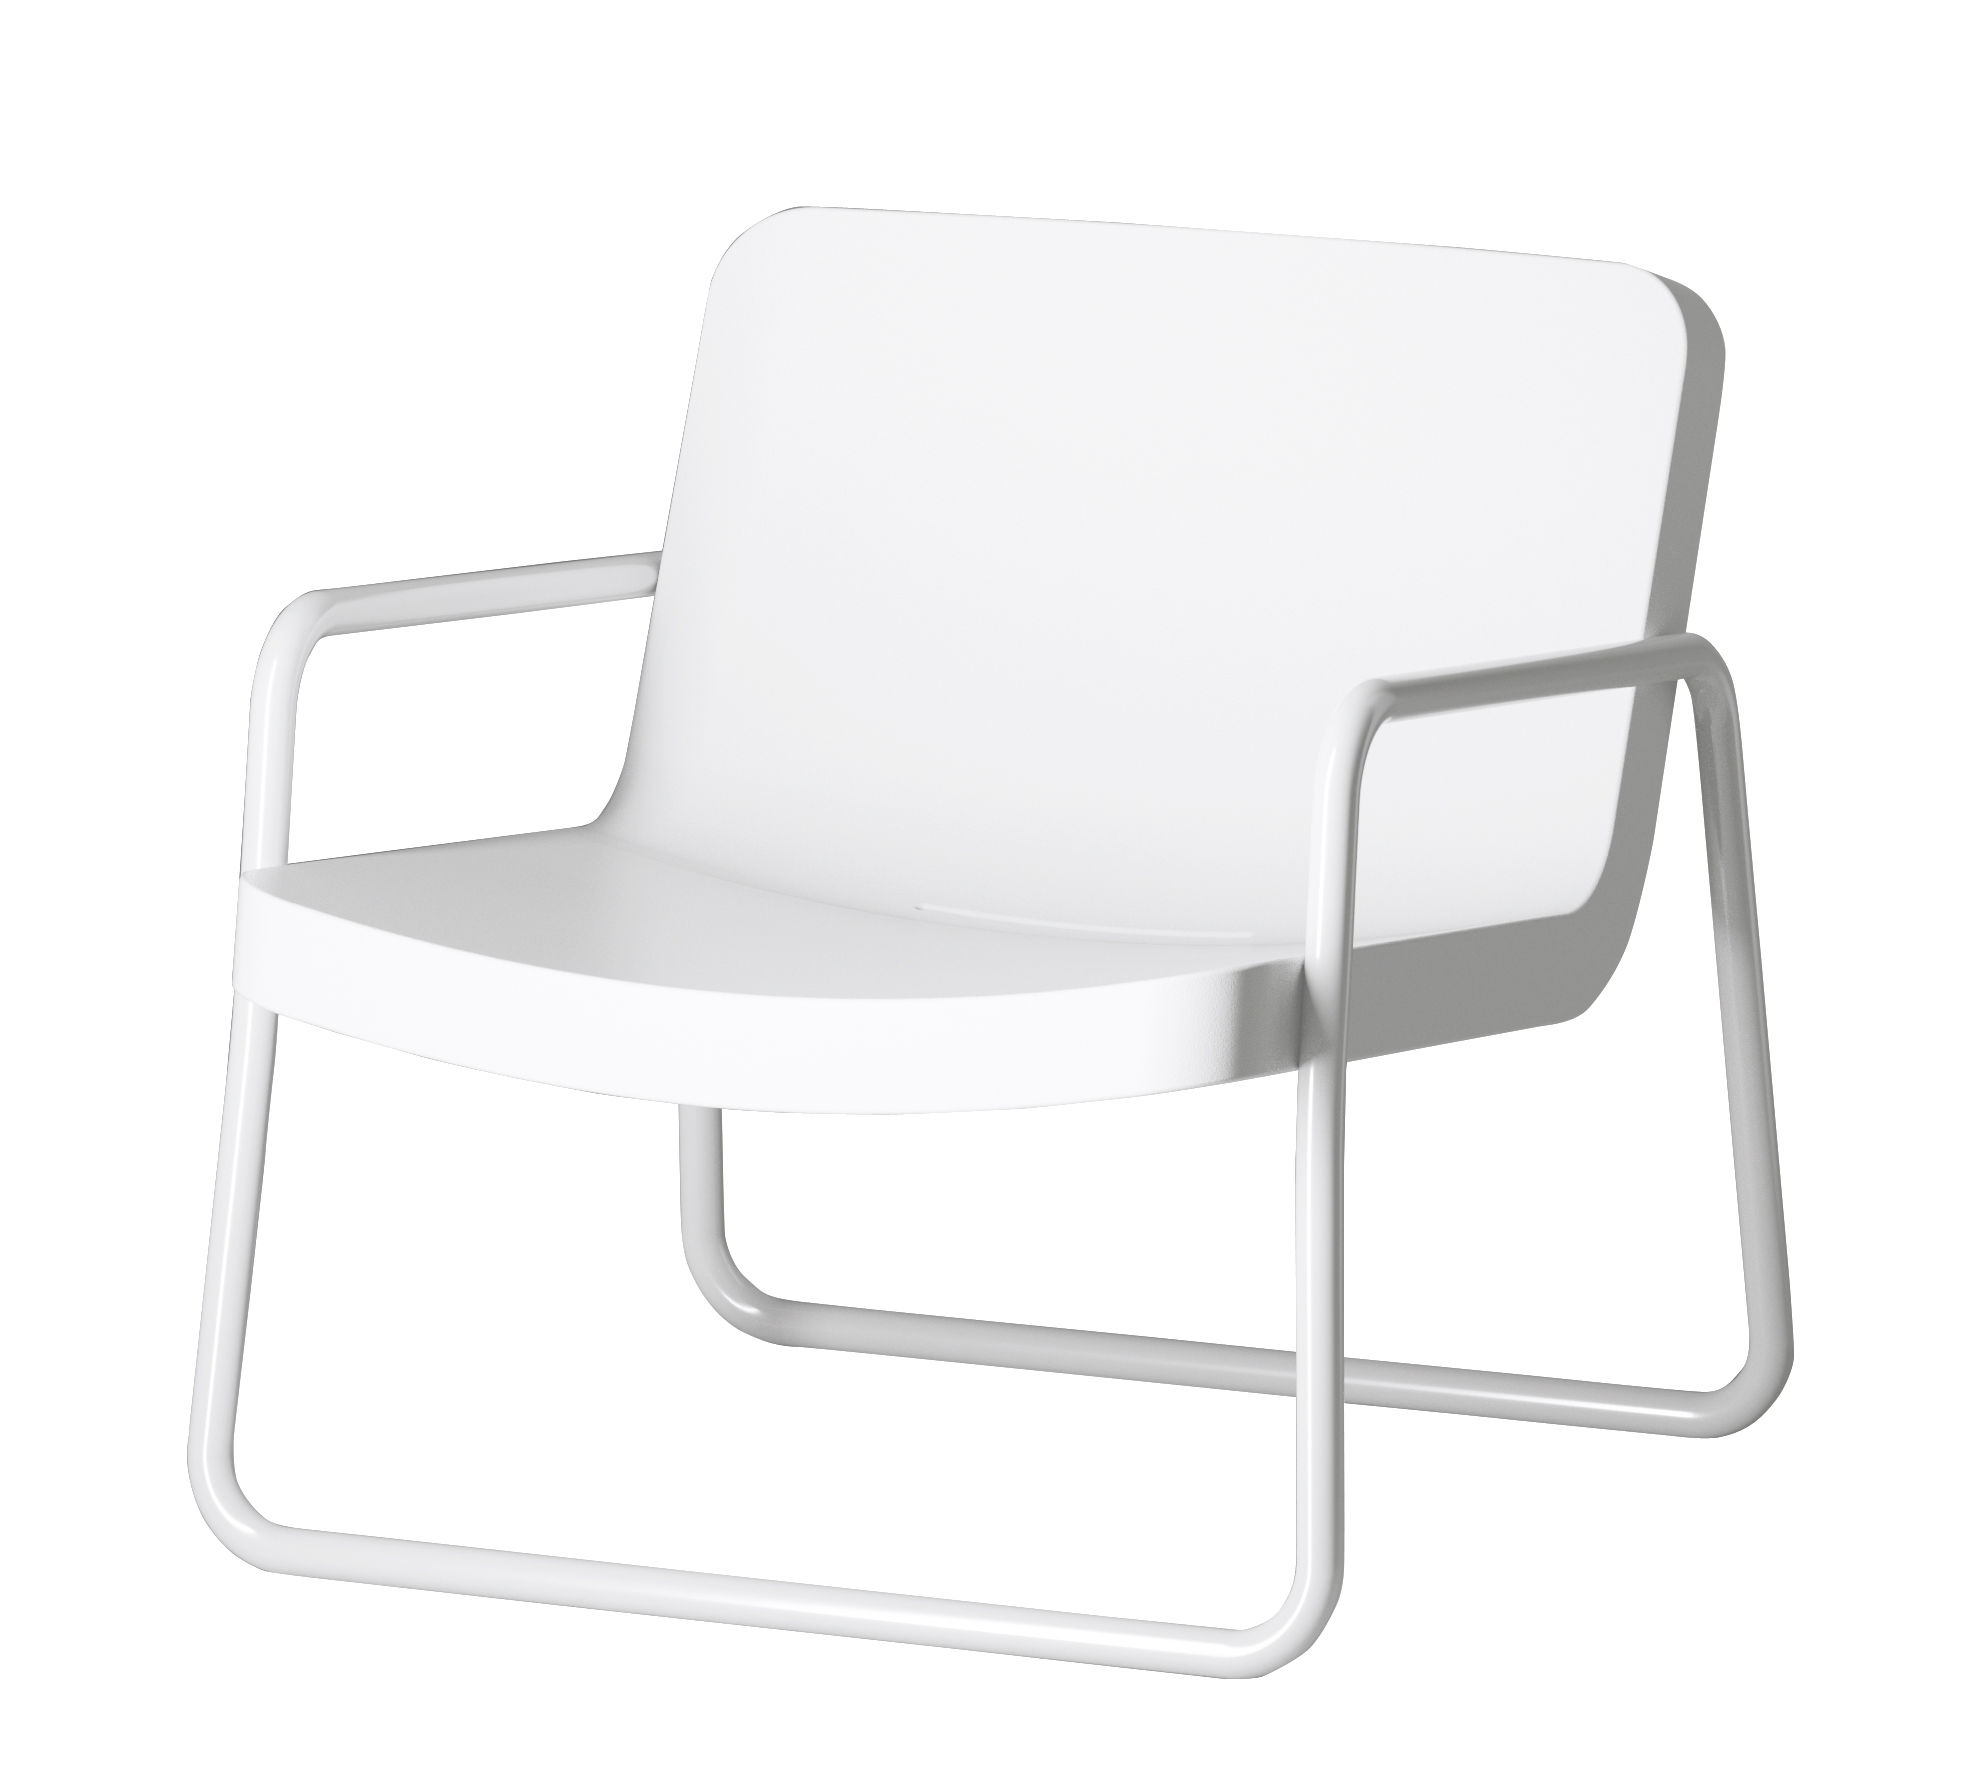 Möbel - Lounge Sessel - Time out Lounge Sessel / stapelbar - Serralunga - Weiß / Gestell weiß - lackiertes Metall, Polyäthylen